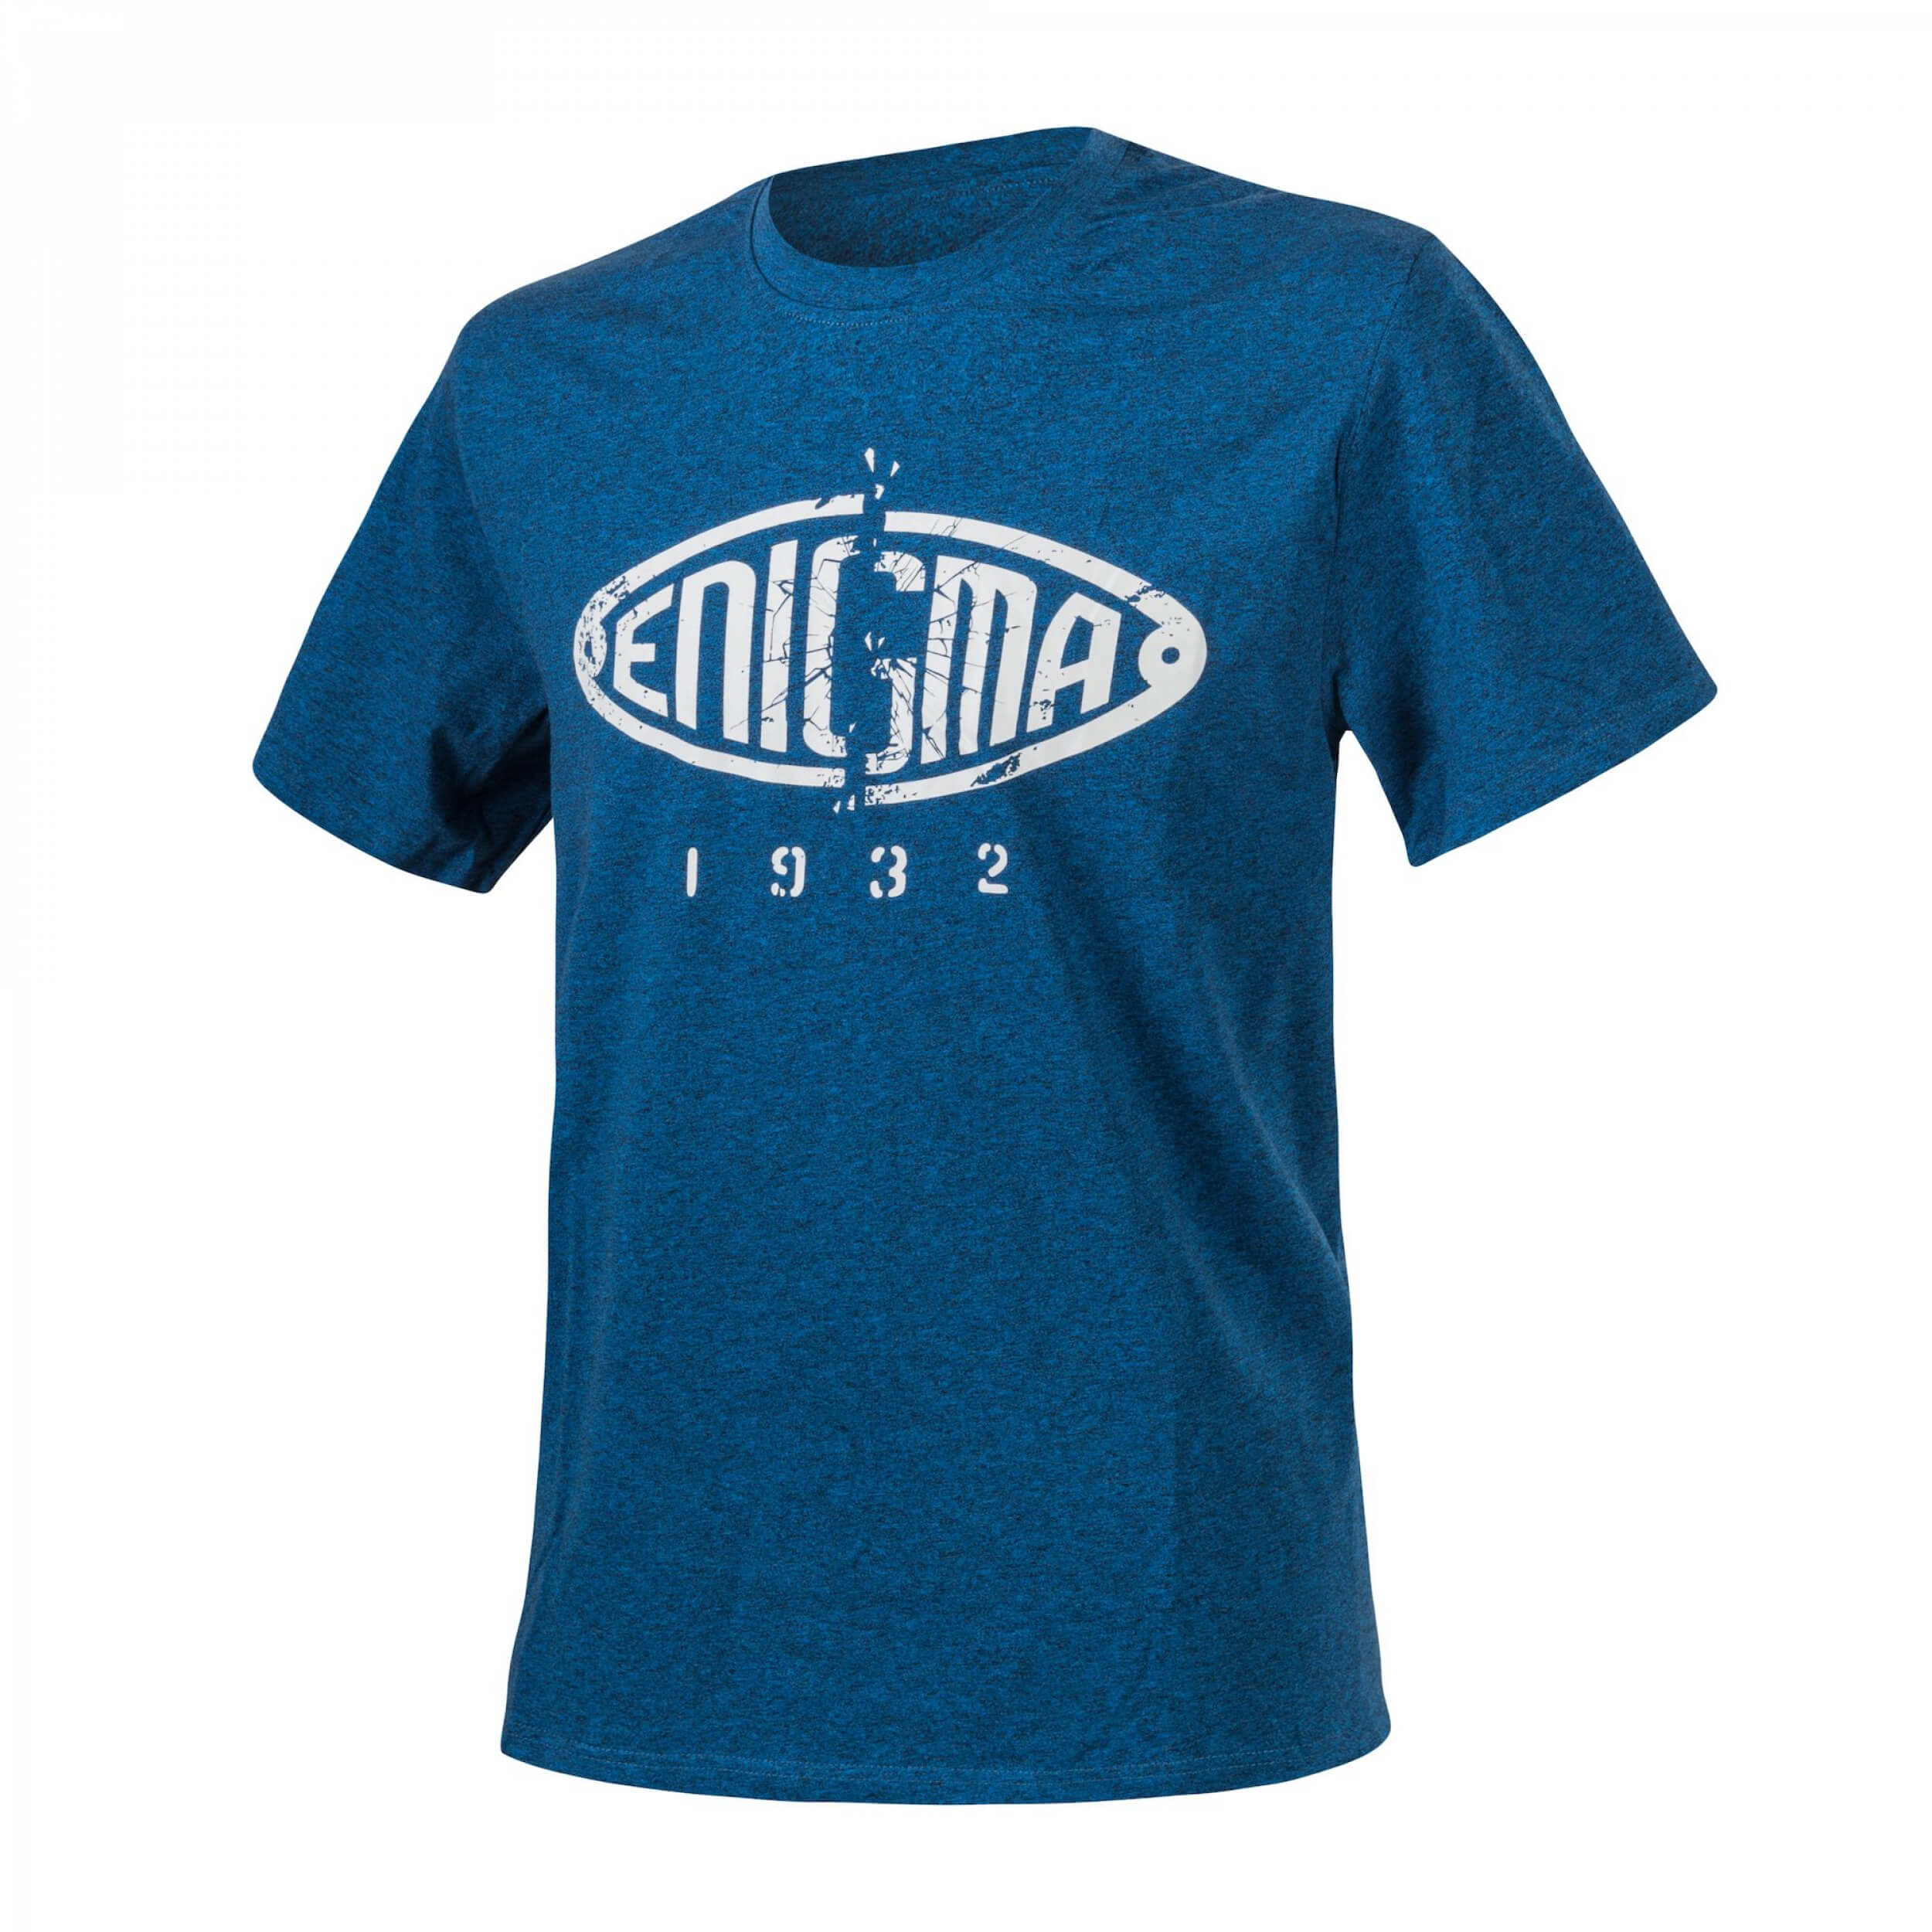 Helikon-Tex T-Shirt (Enigma) -Cotton- Melange Blue